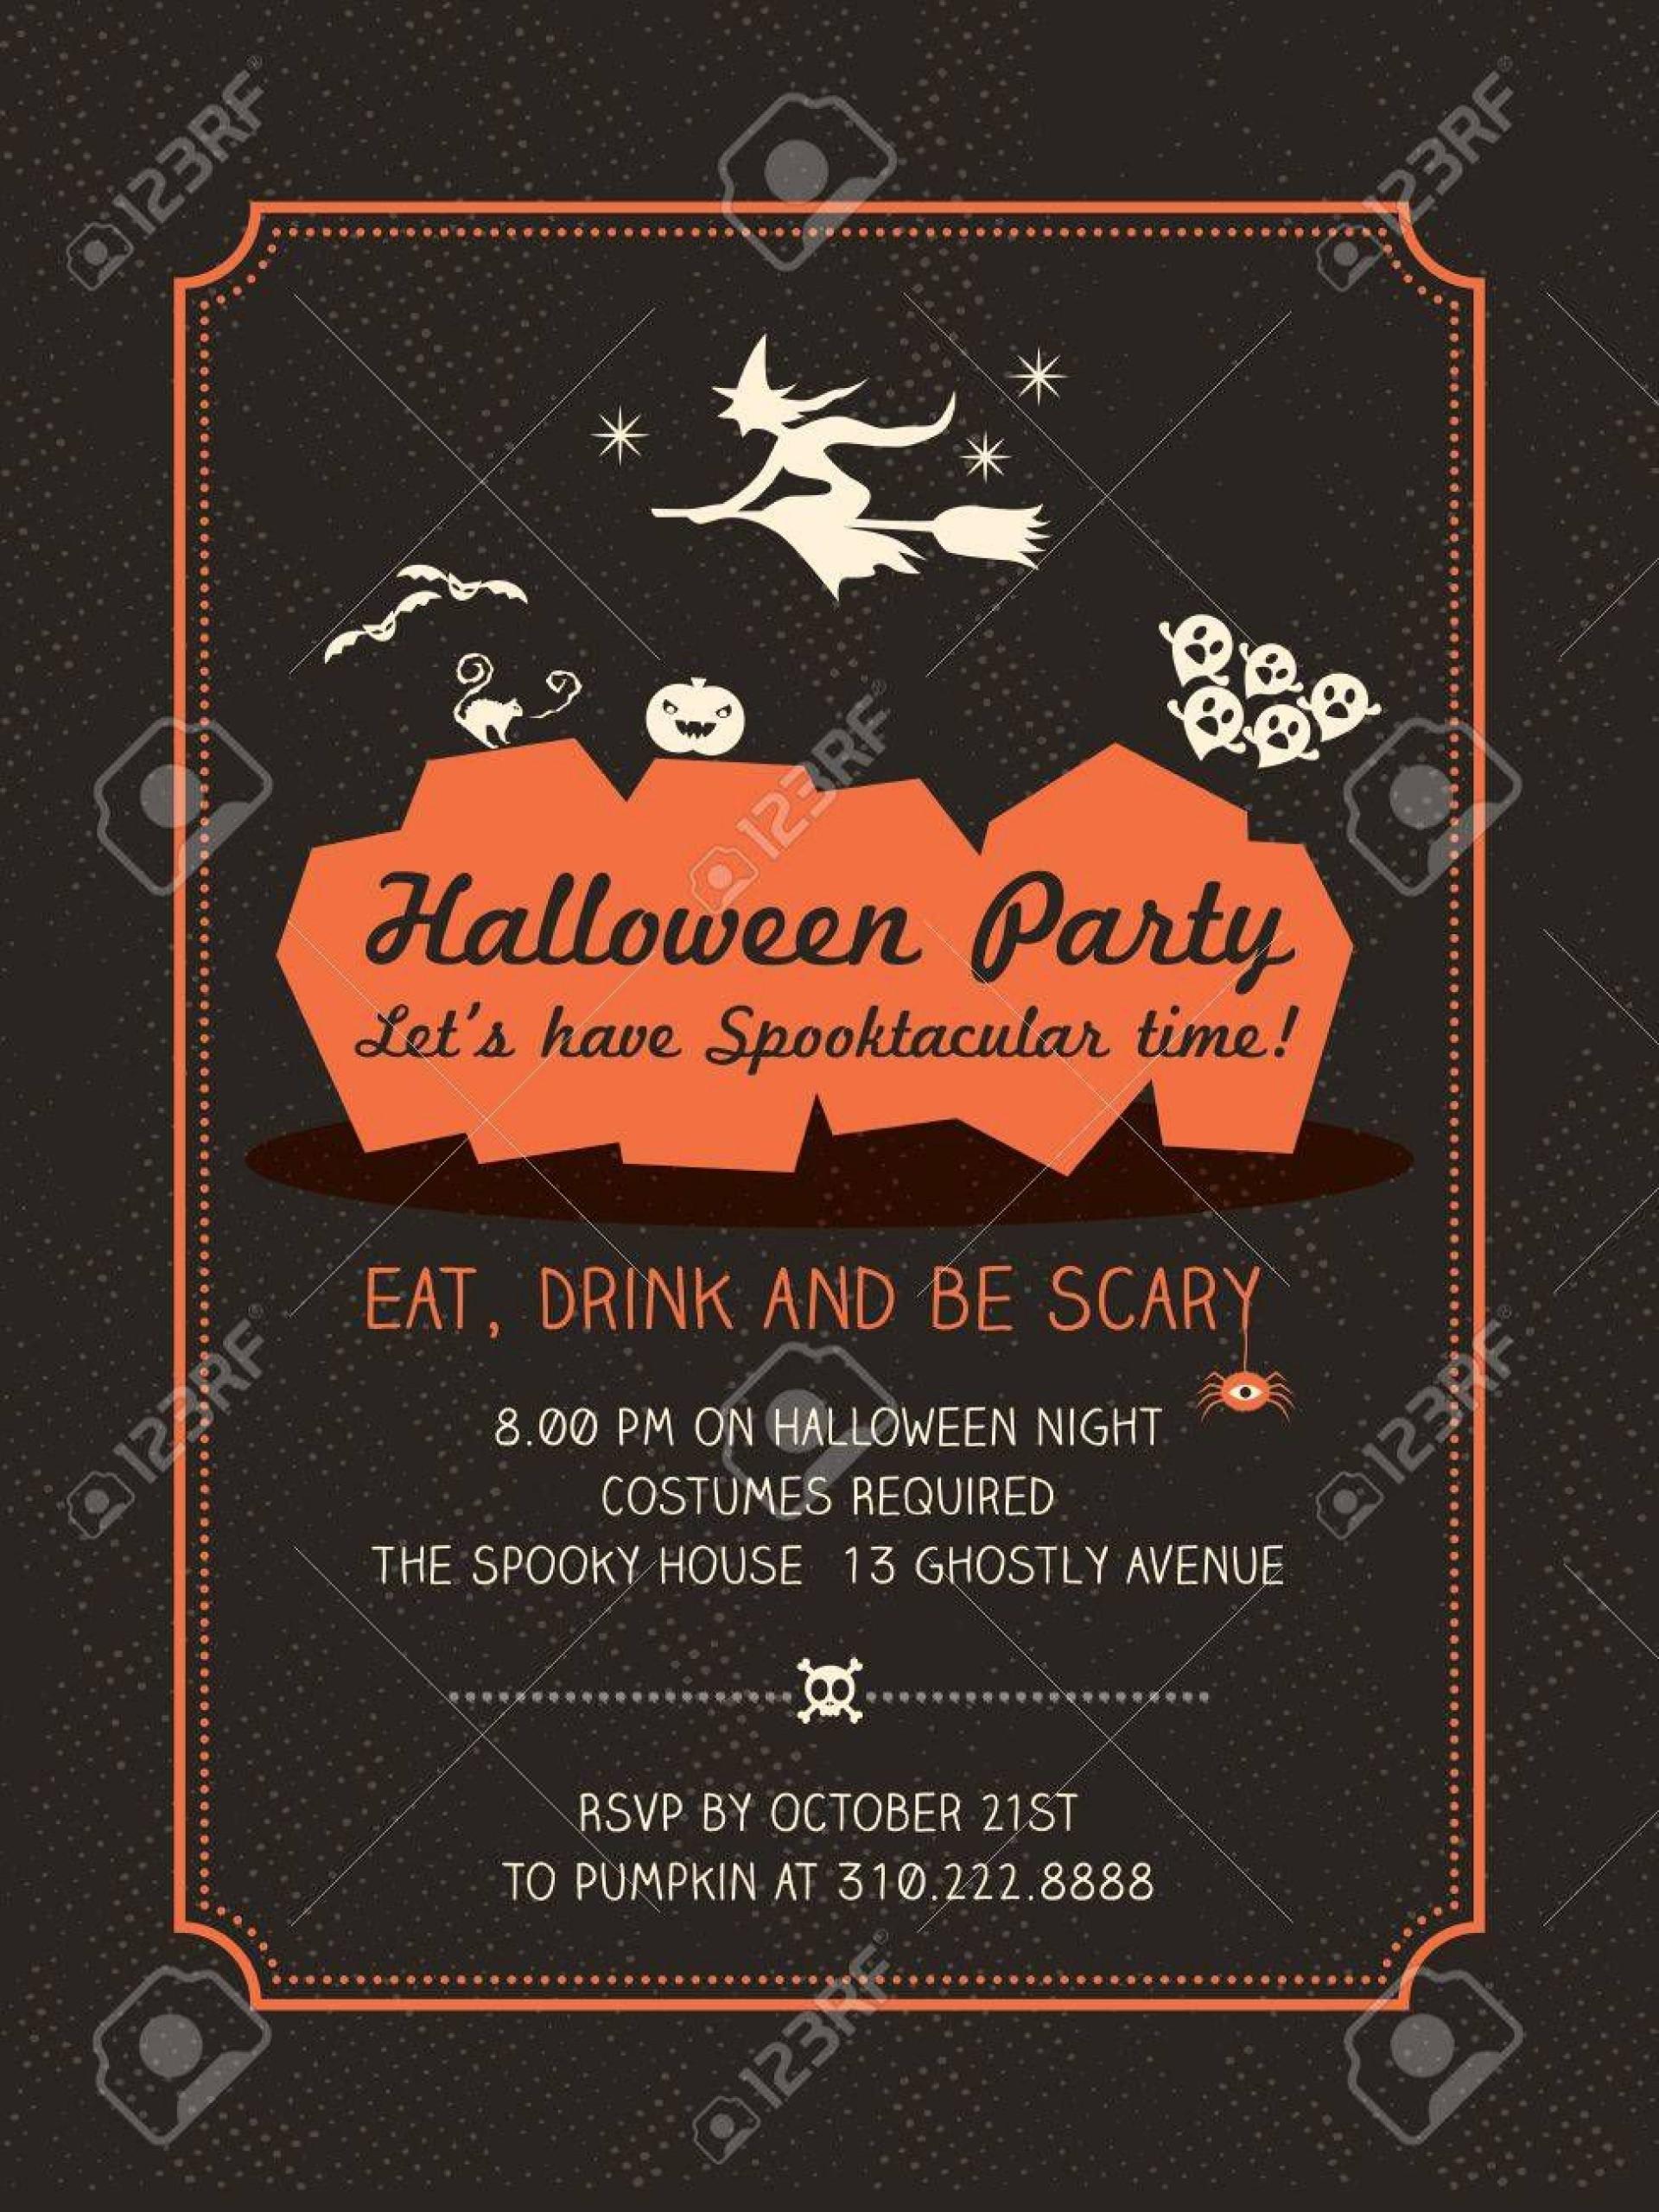 005 Stunning Halloween Party Invitation Template Example  Microsoft Block October1920